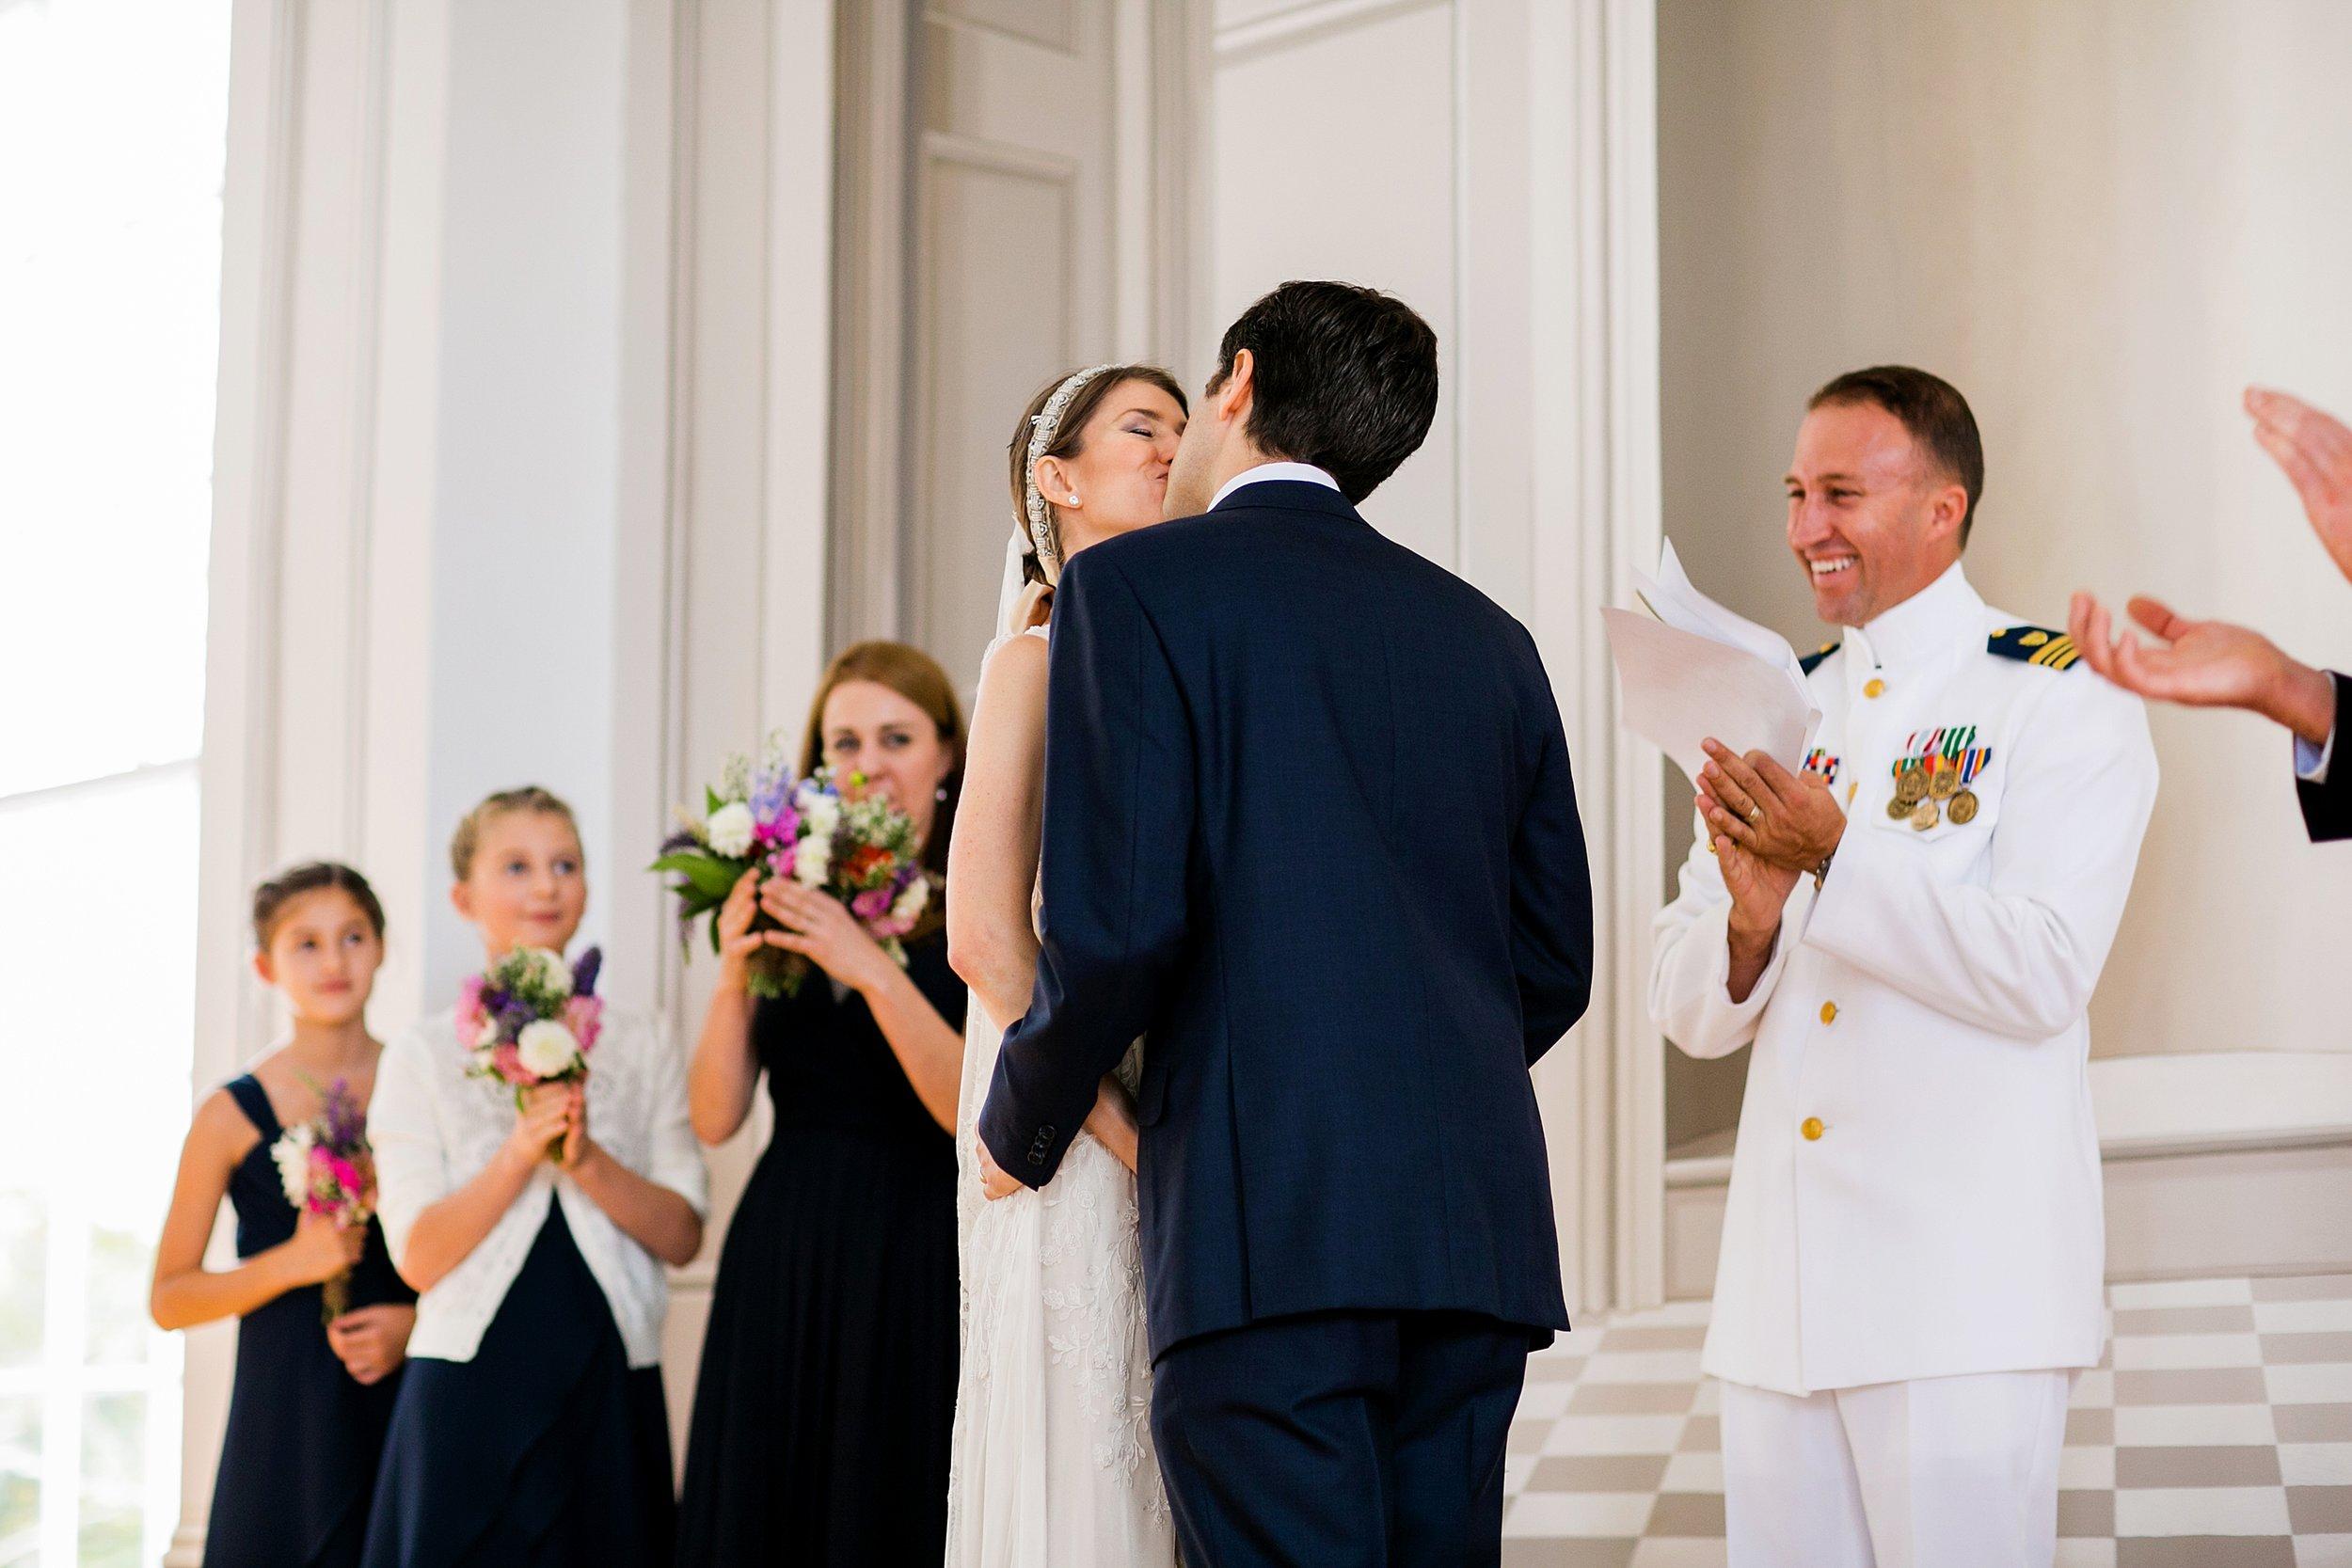 030 marthas vineyard wedding photographer todd danforth photography.jpg